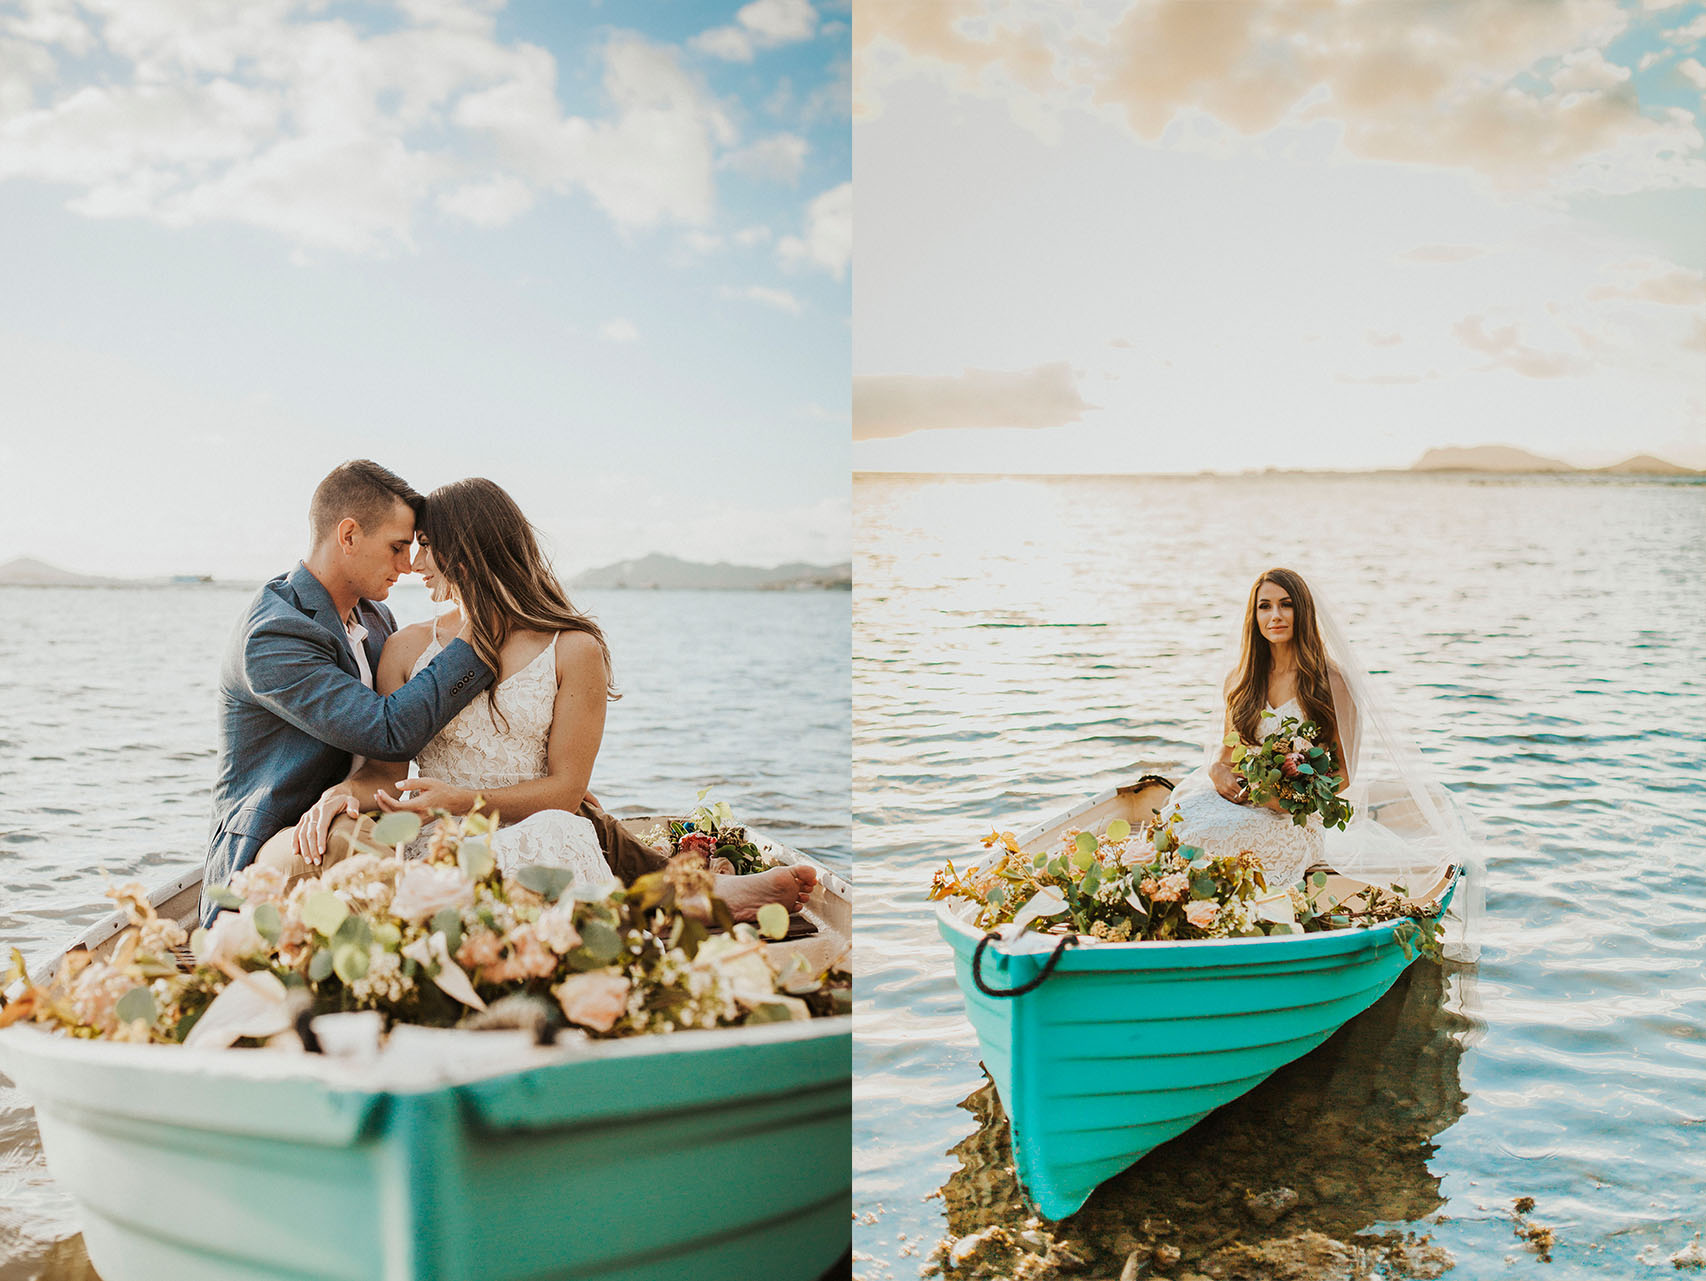 Bridal Boat, Adventurous At heart Retreat. New Wave Photography2.jpg